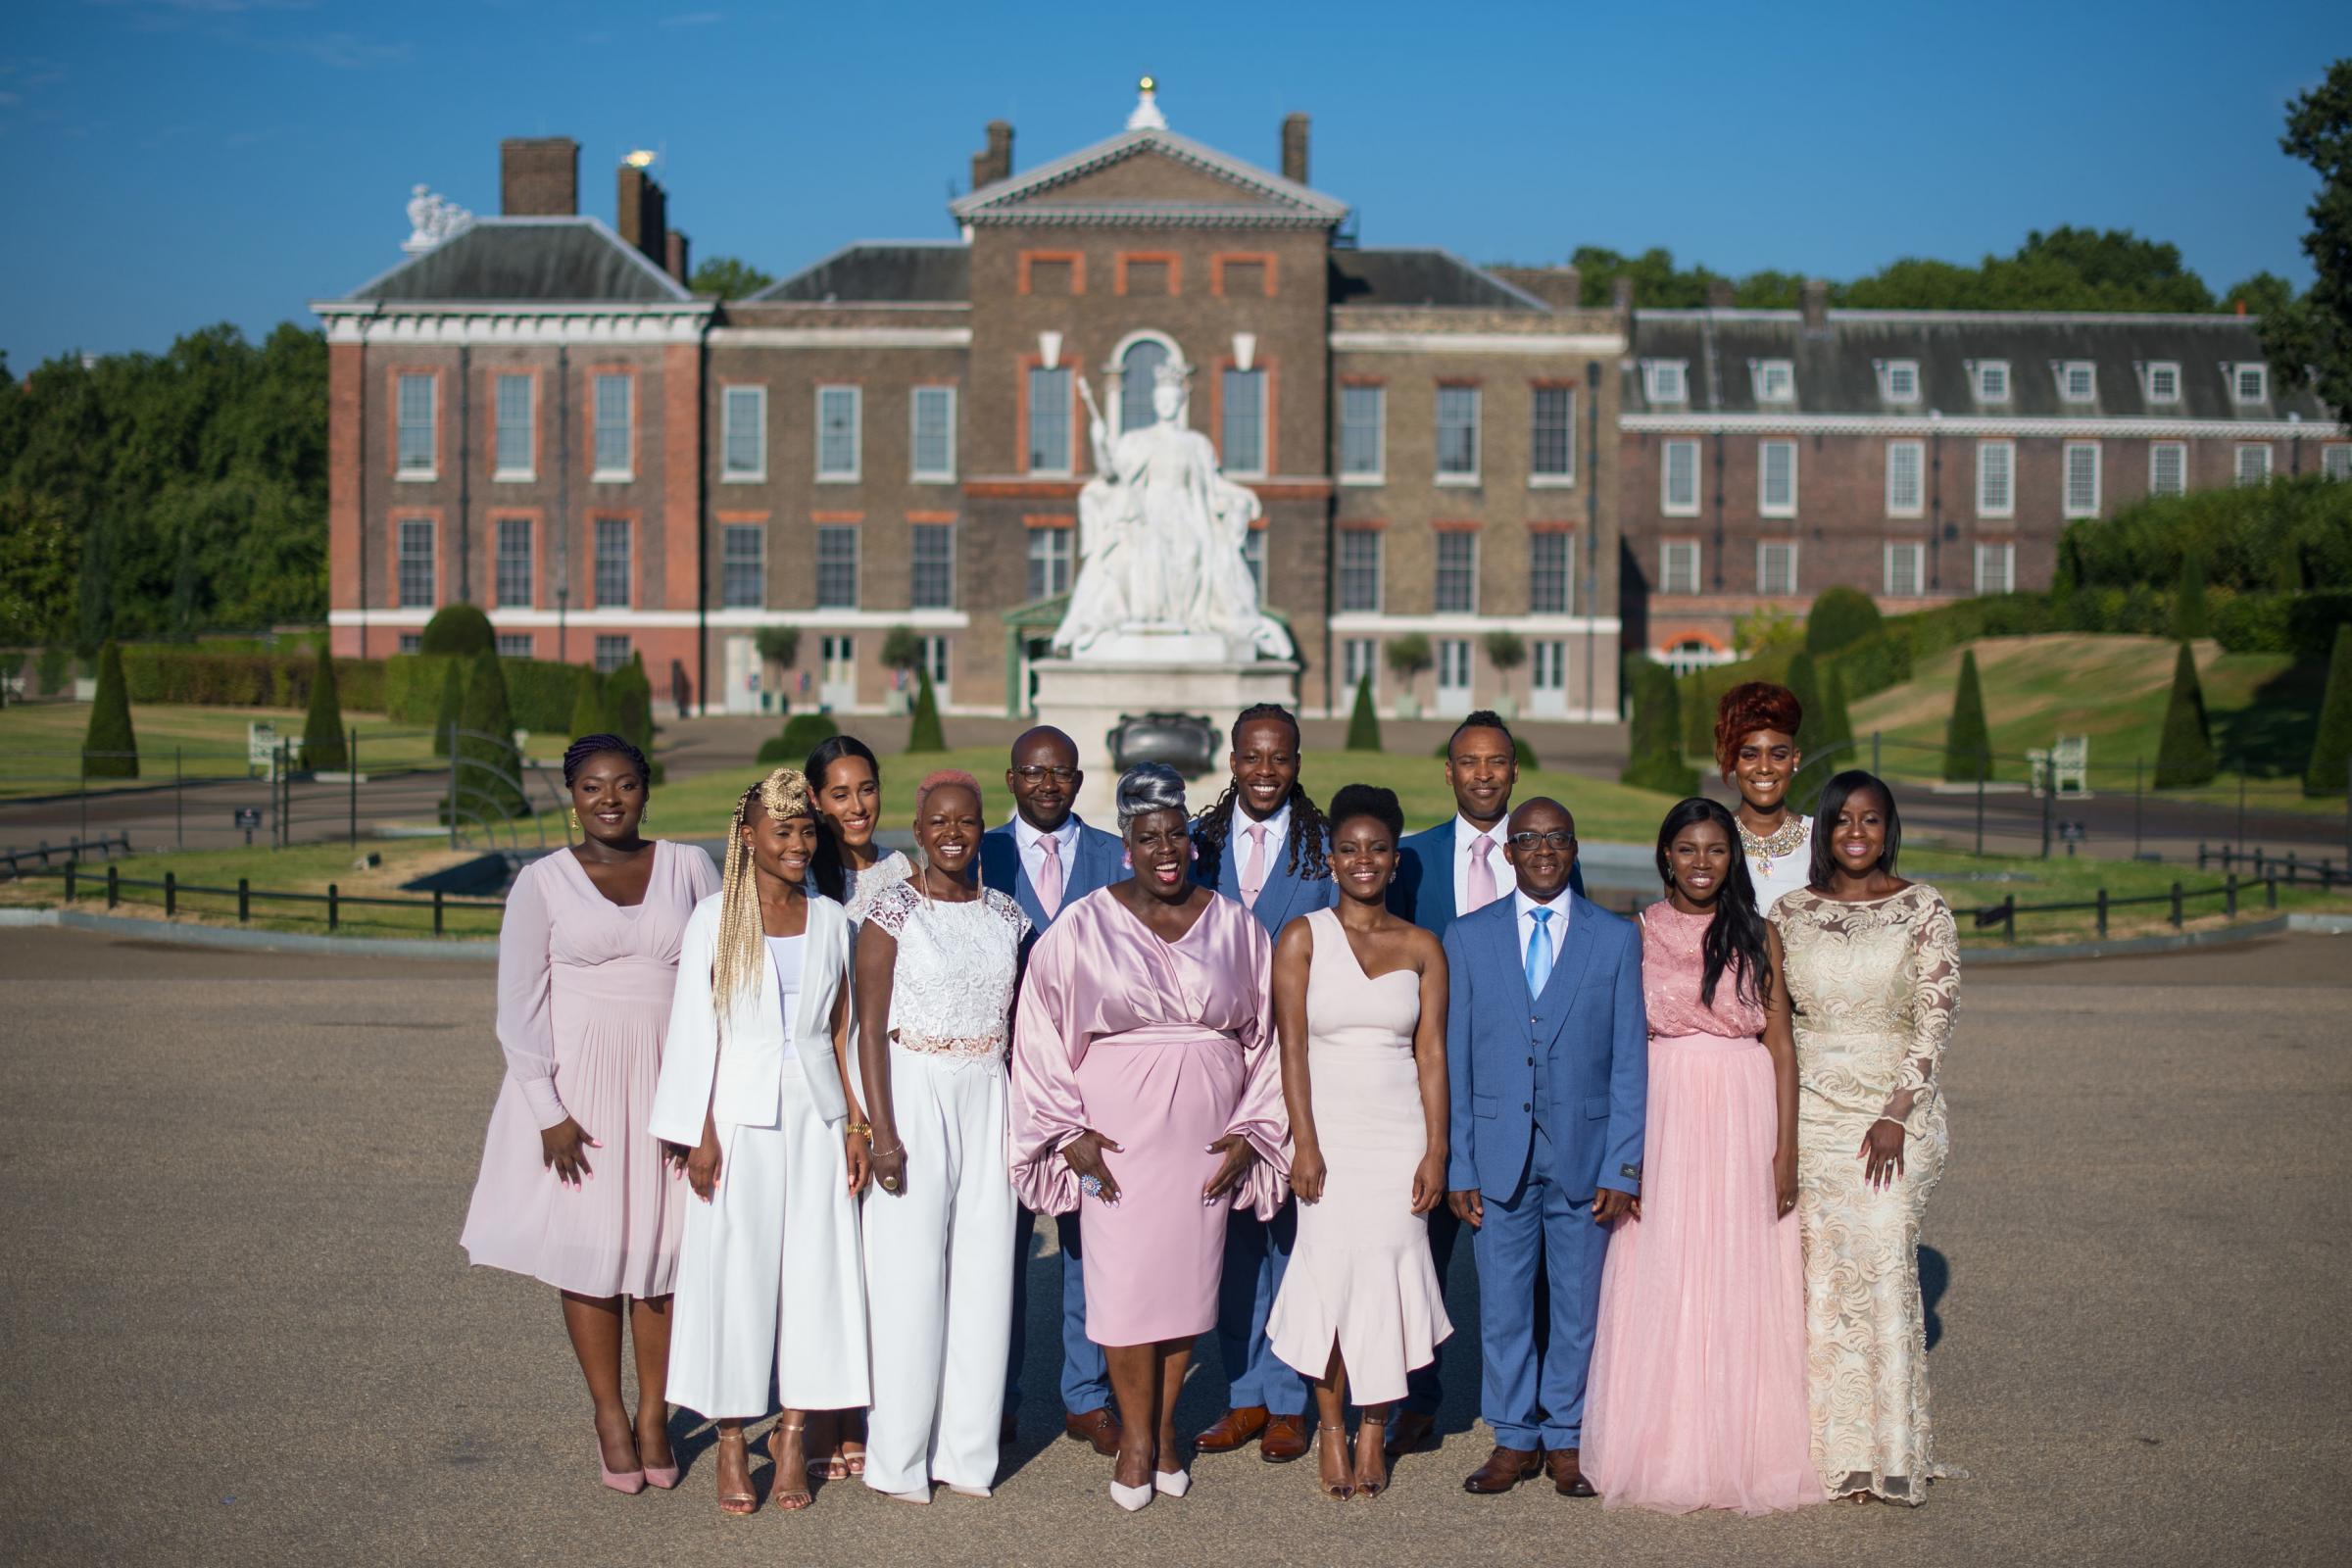 The Kingdom Choir: Our royal wedding success is a dream we dared not dream